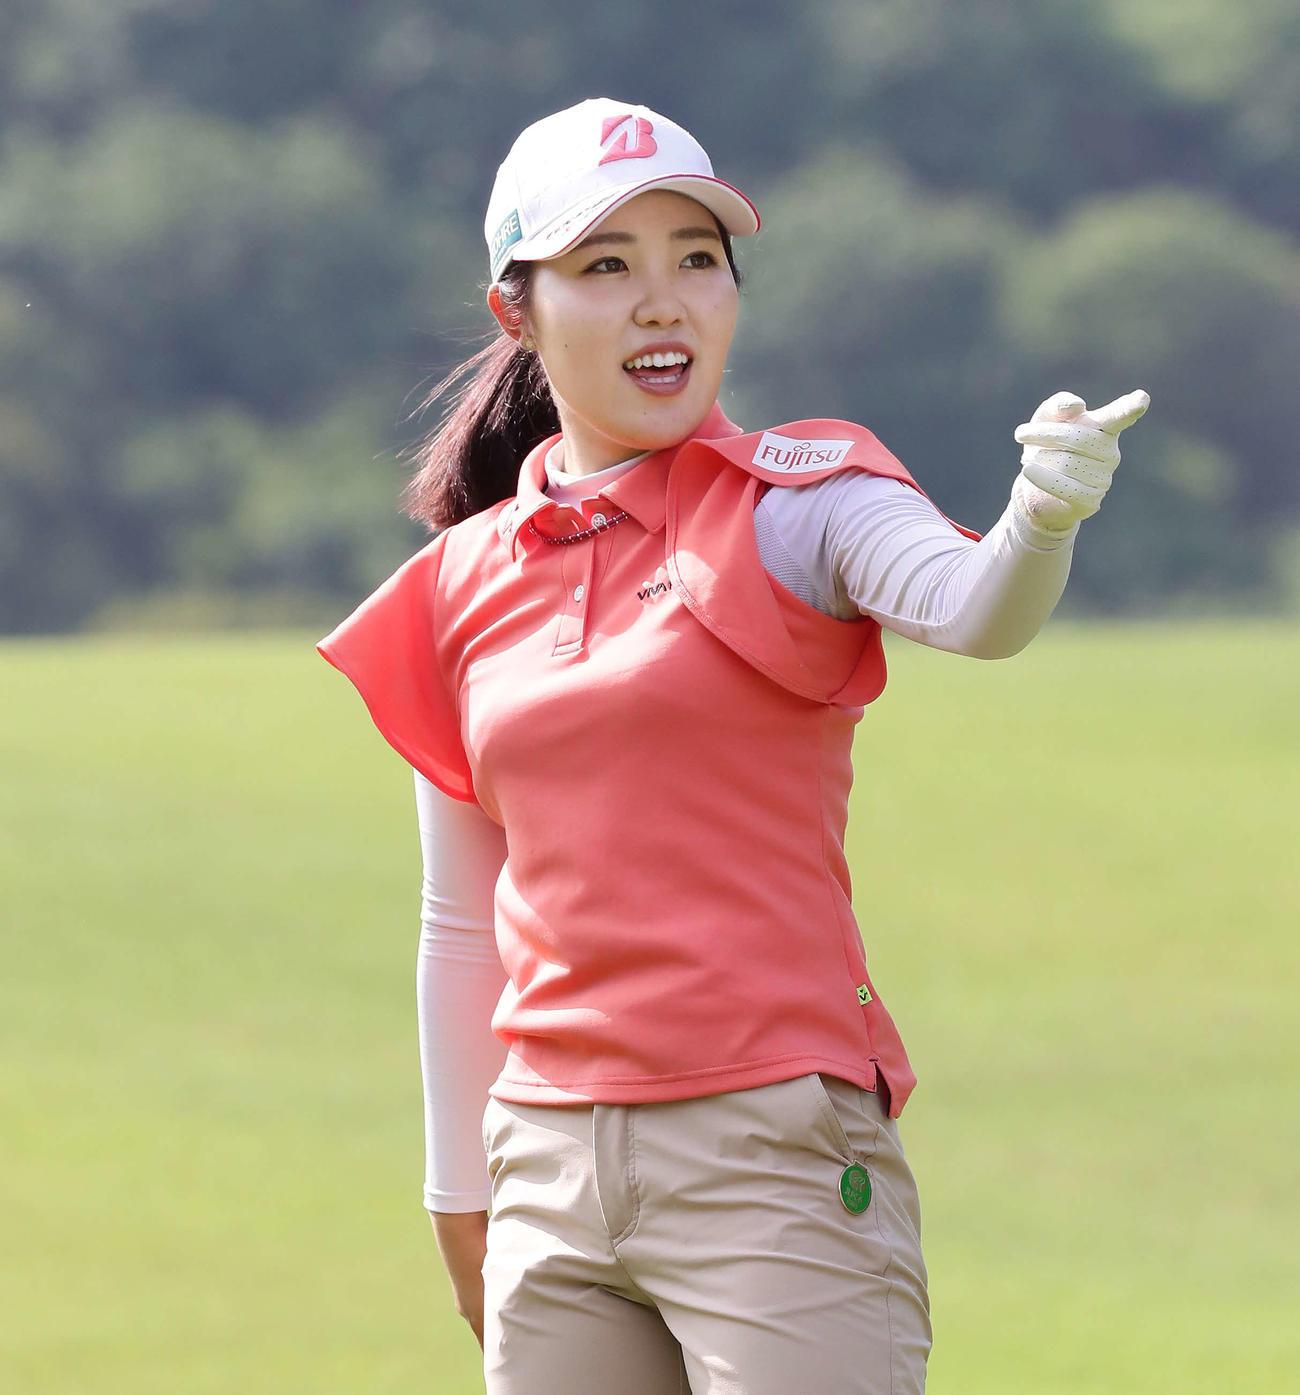 https://www.nikkansports.com/sports/golf/news/img/202106030000143-w1300_0.jpg